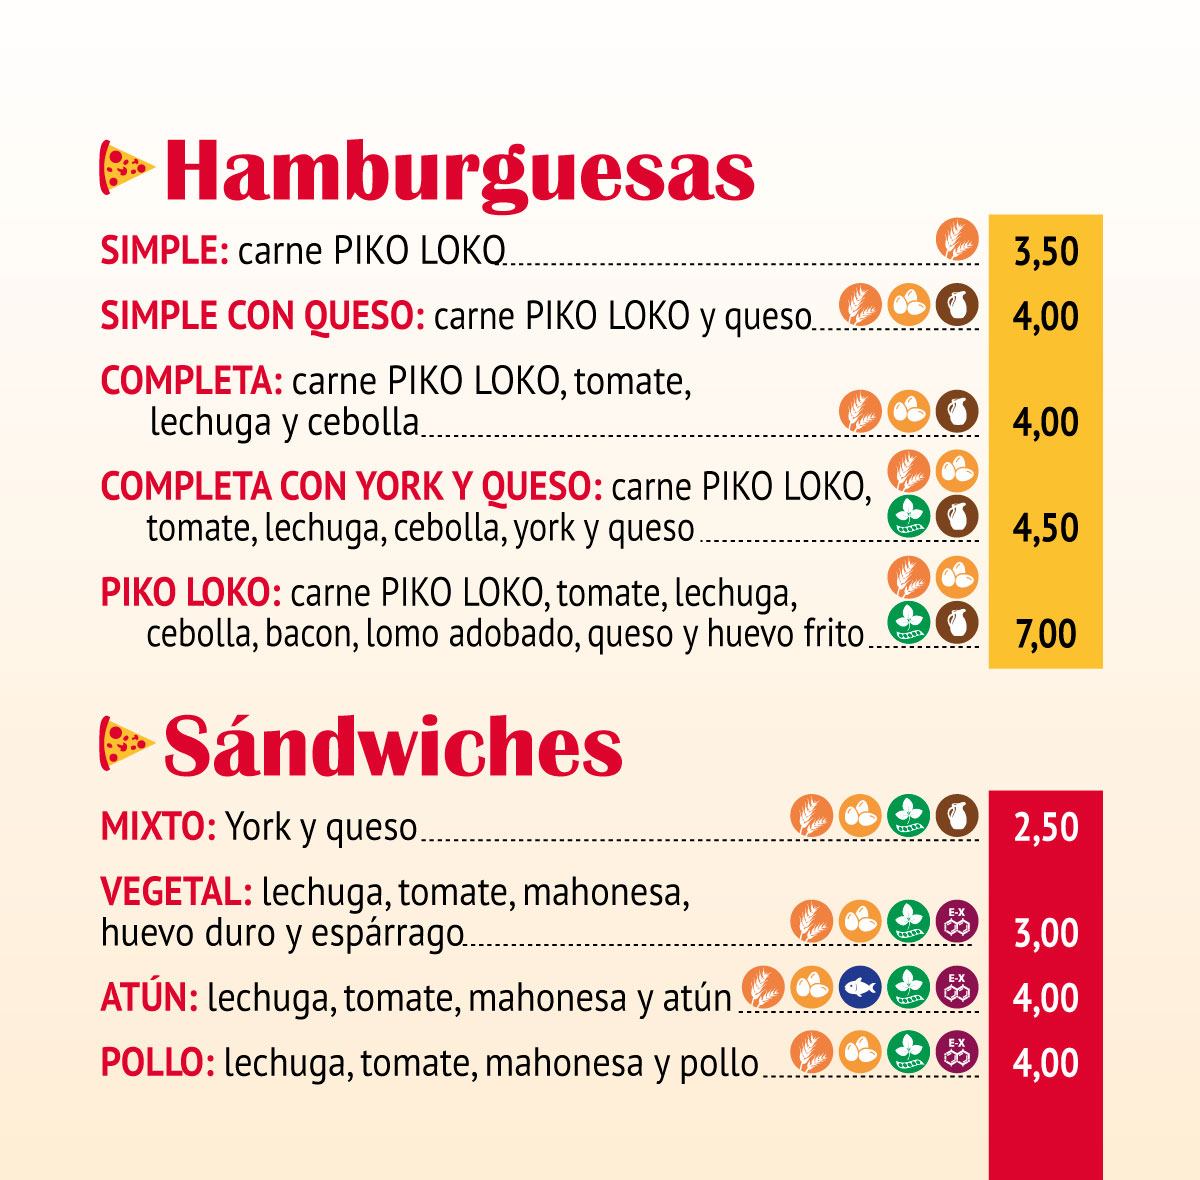 piko_loko_hamburguesas-y-sandwiches